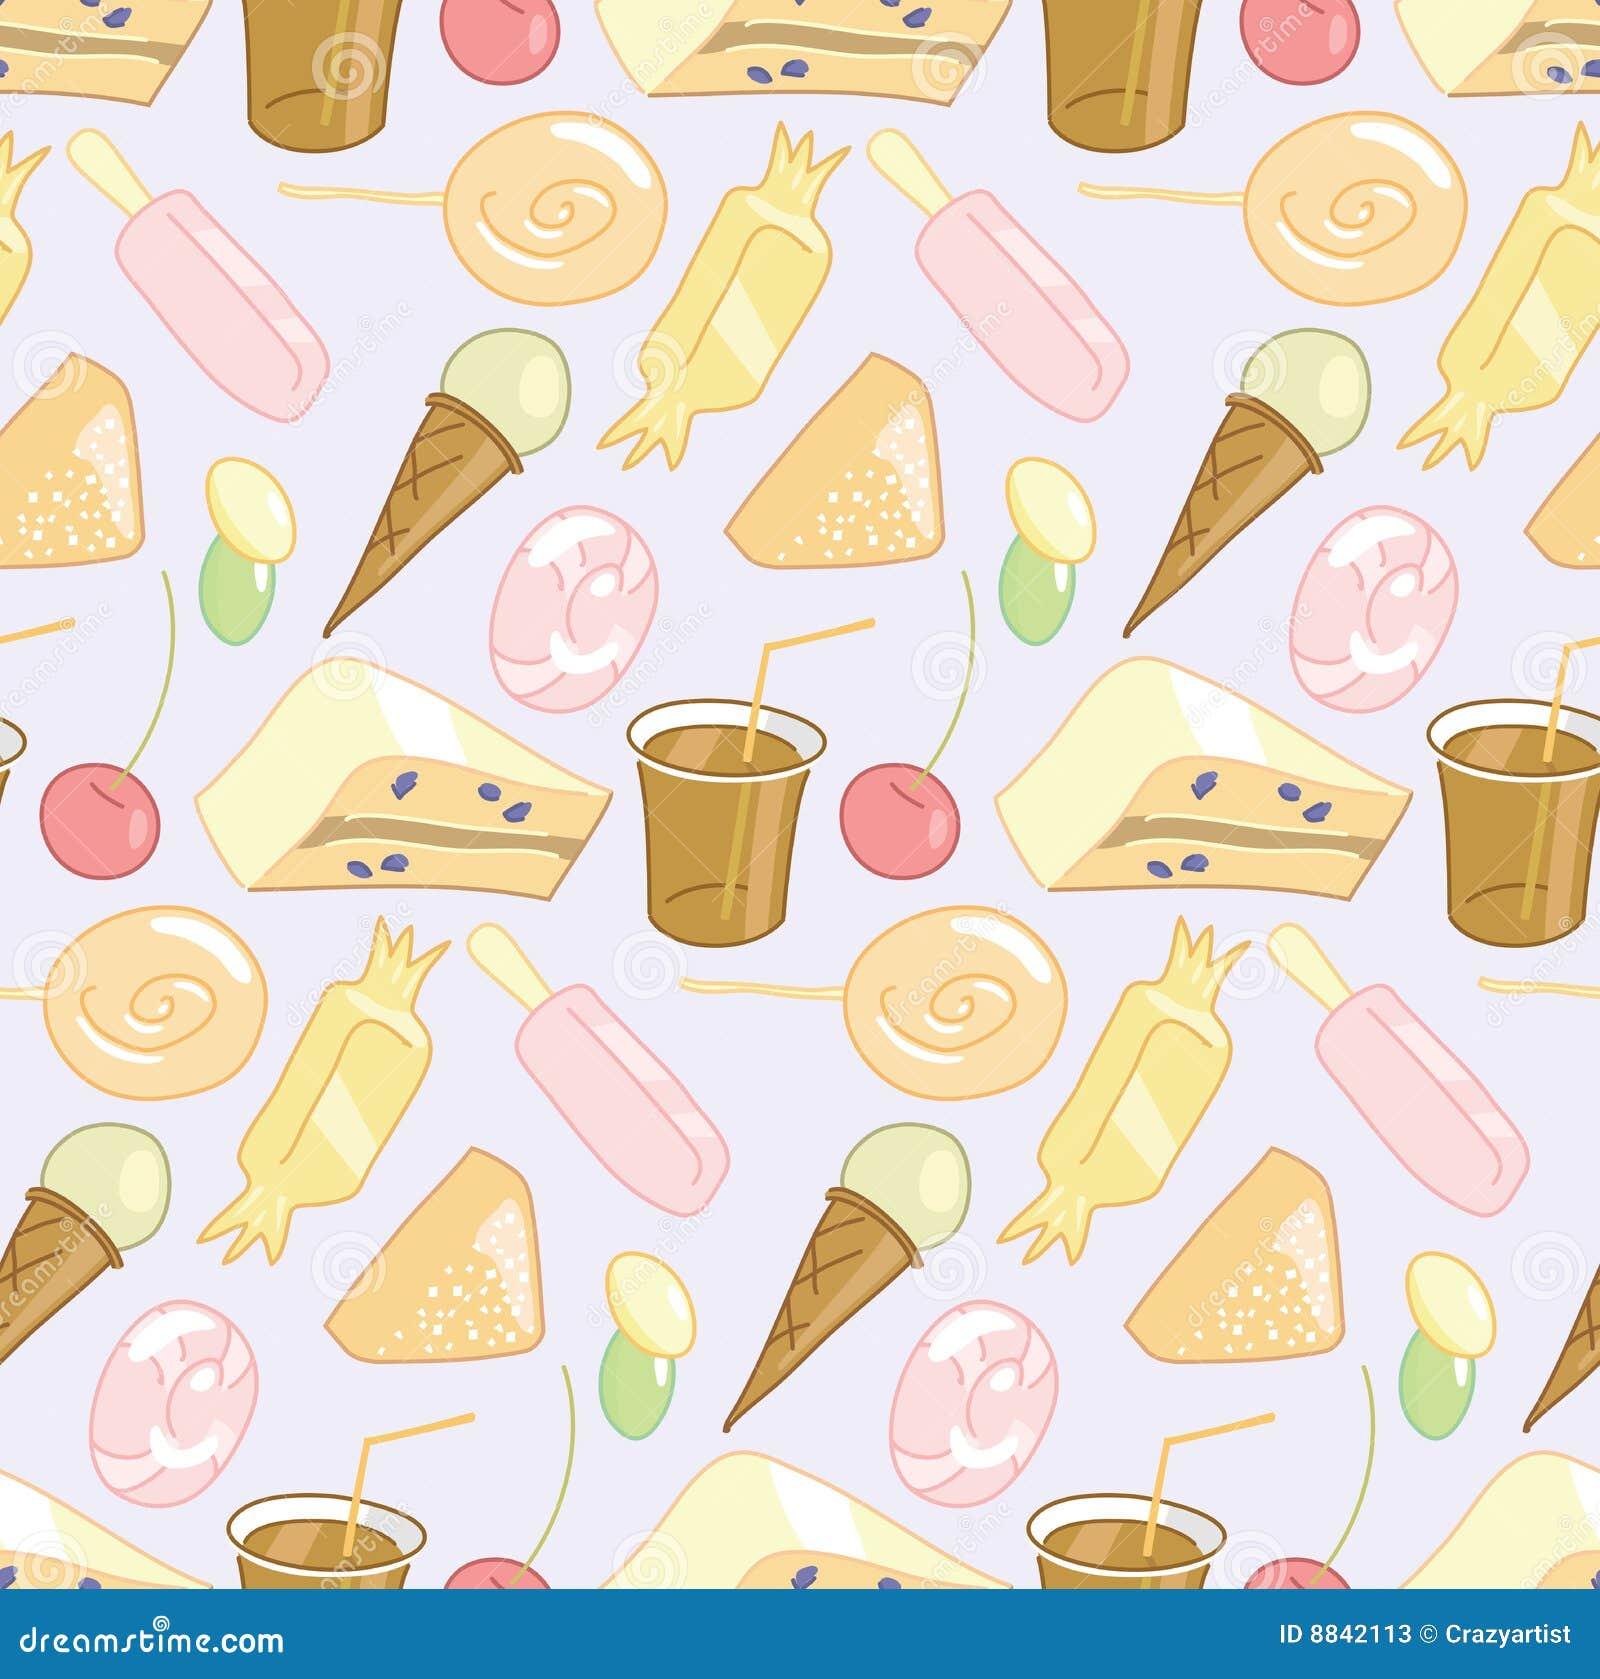 Candy shop seamless pattern